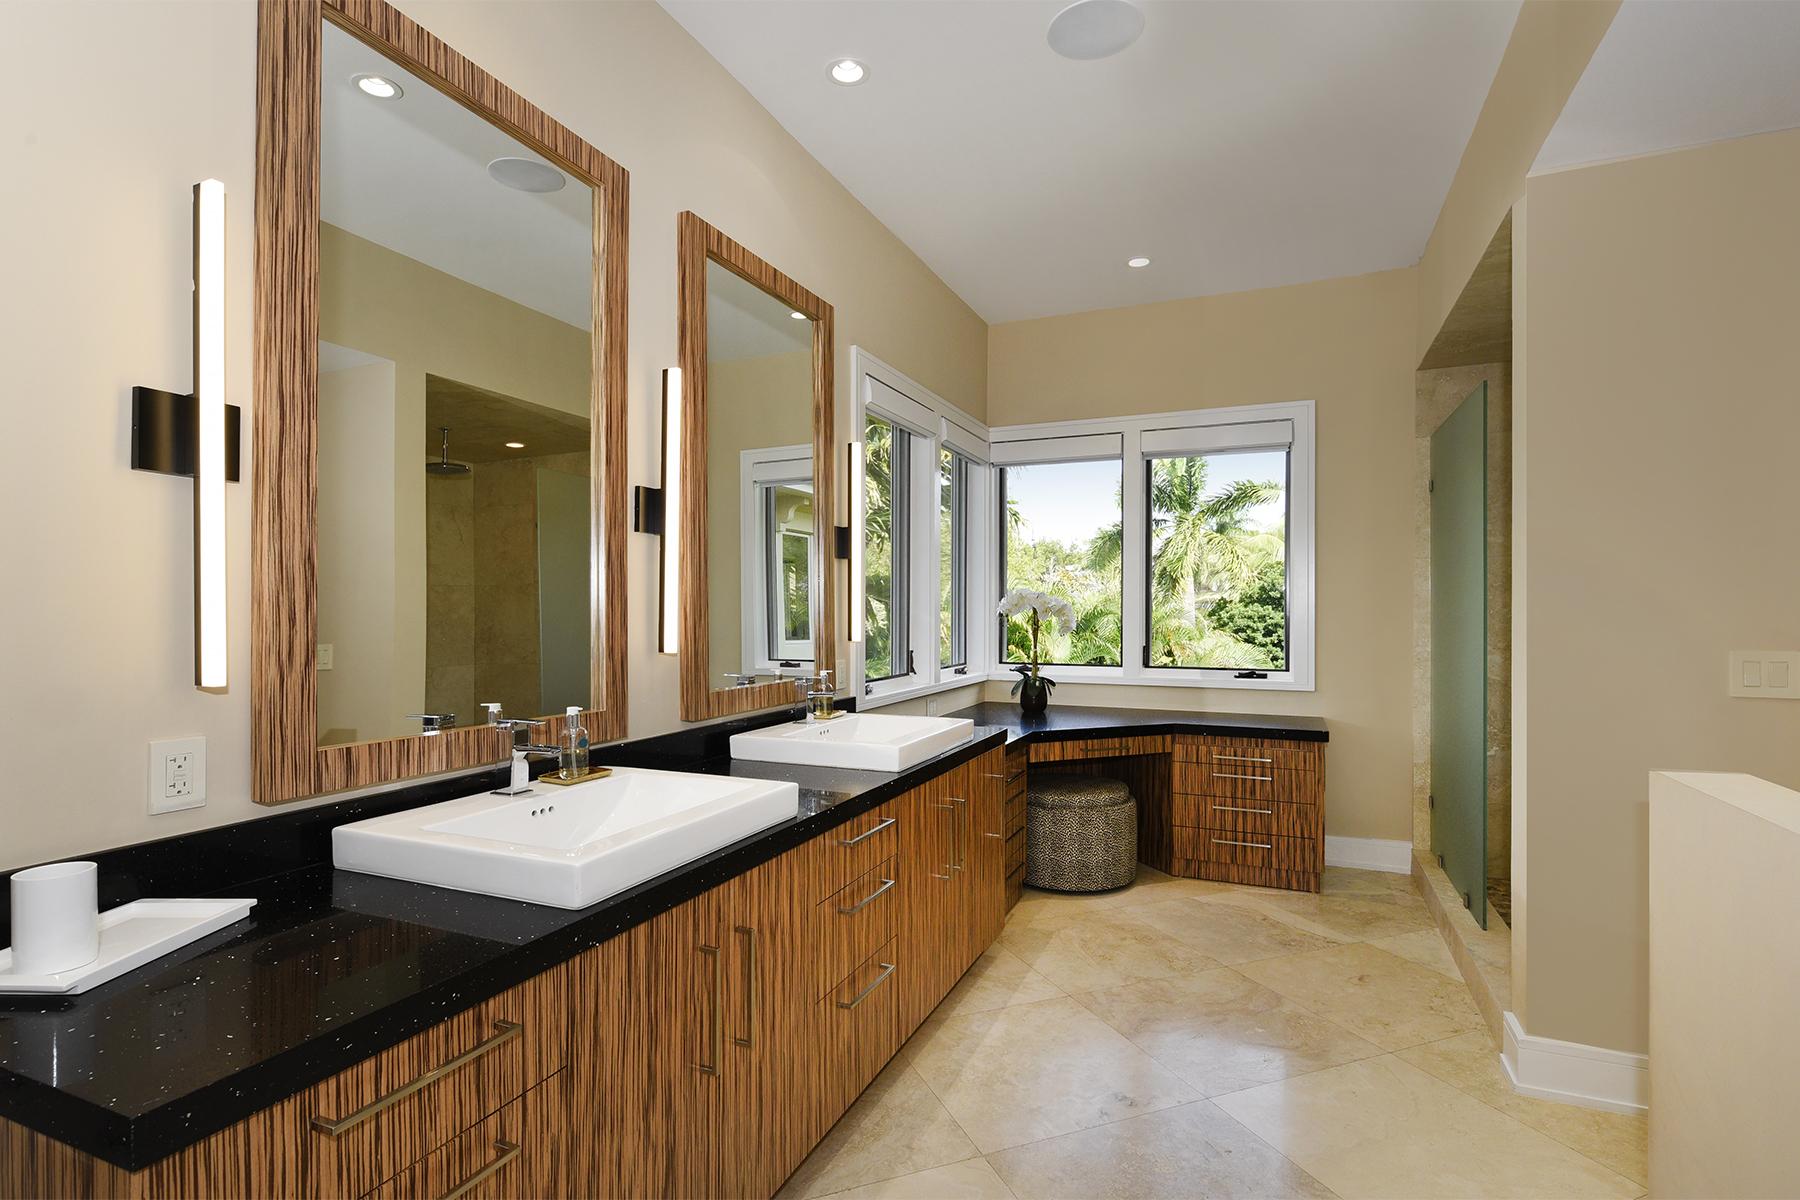 Additional photo for property listing at Casa Del Sol 169 Indian Mound Trail Islamorada, Florida 33070 États-Unis